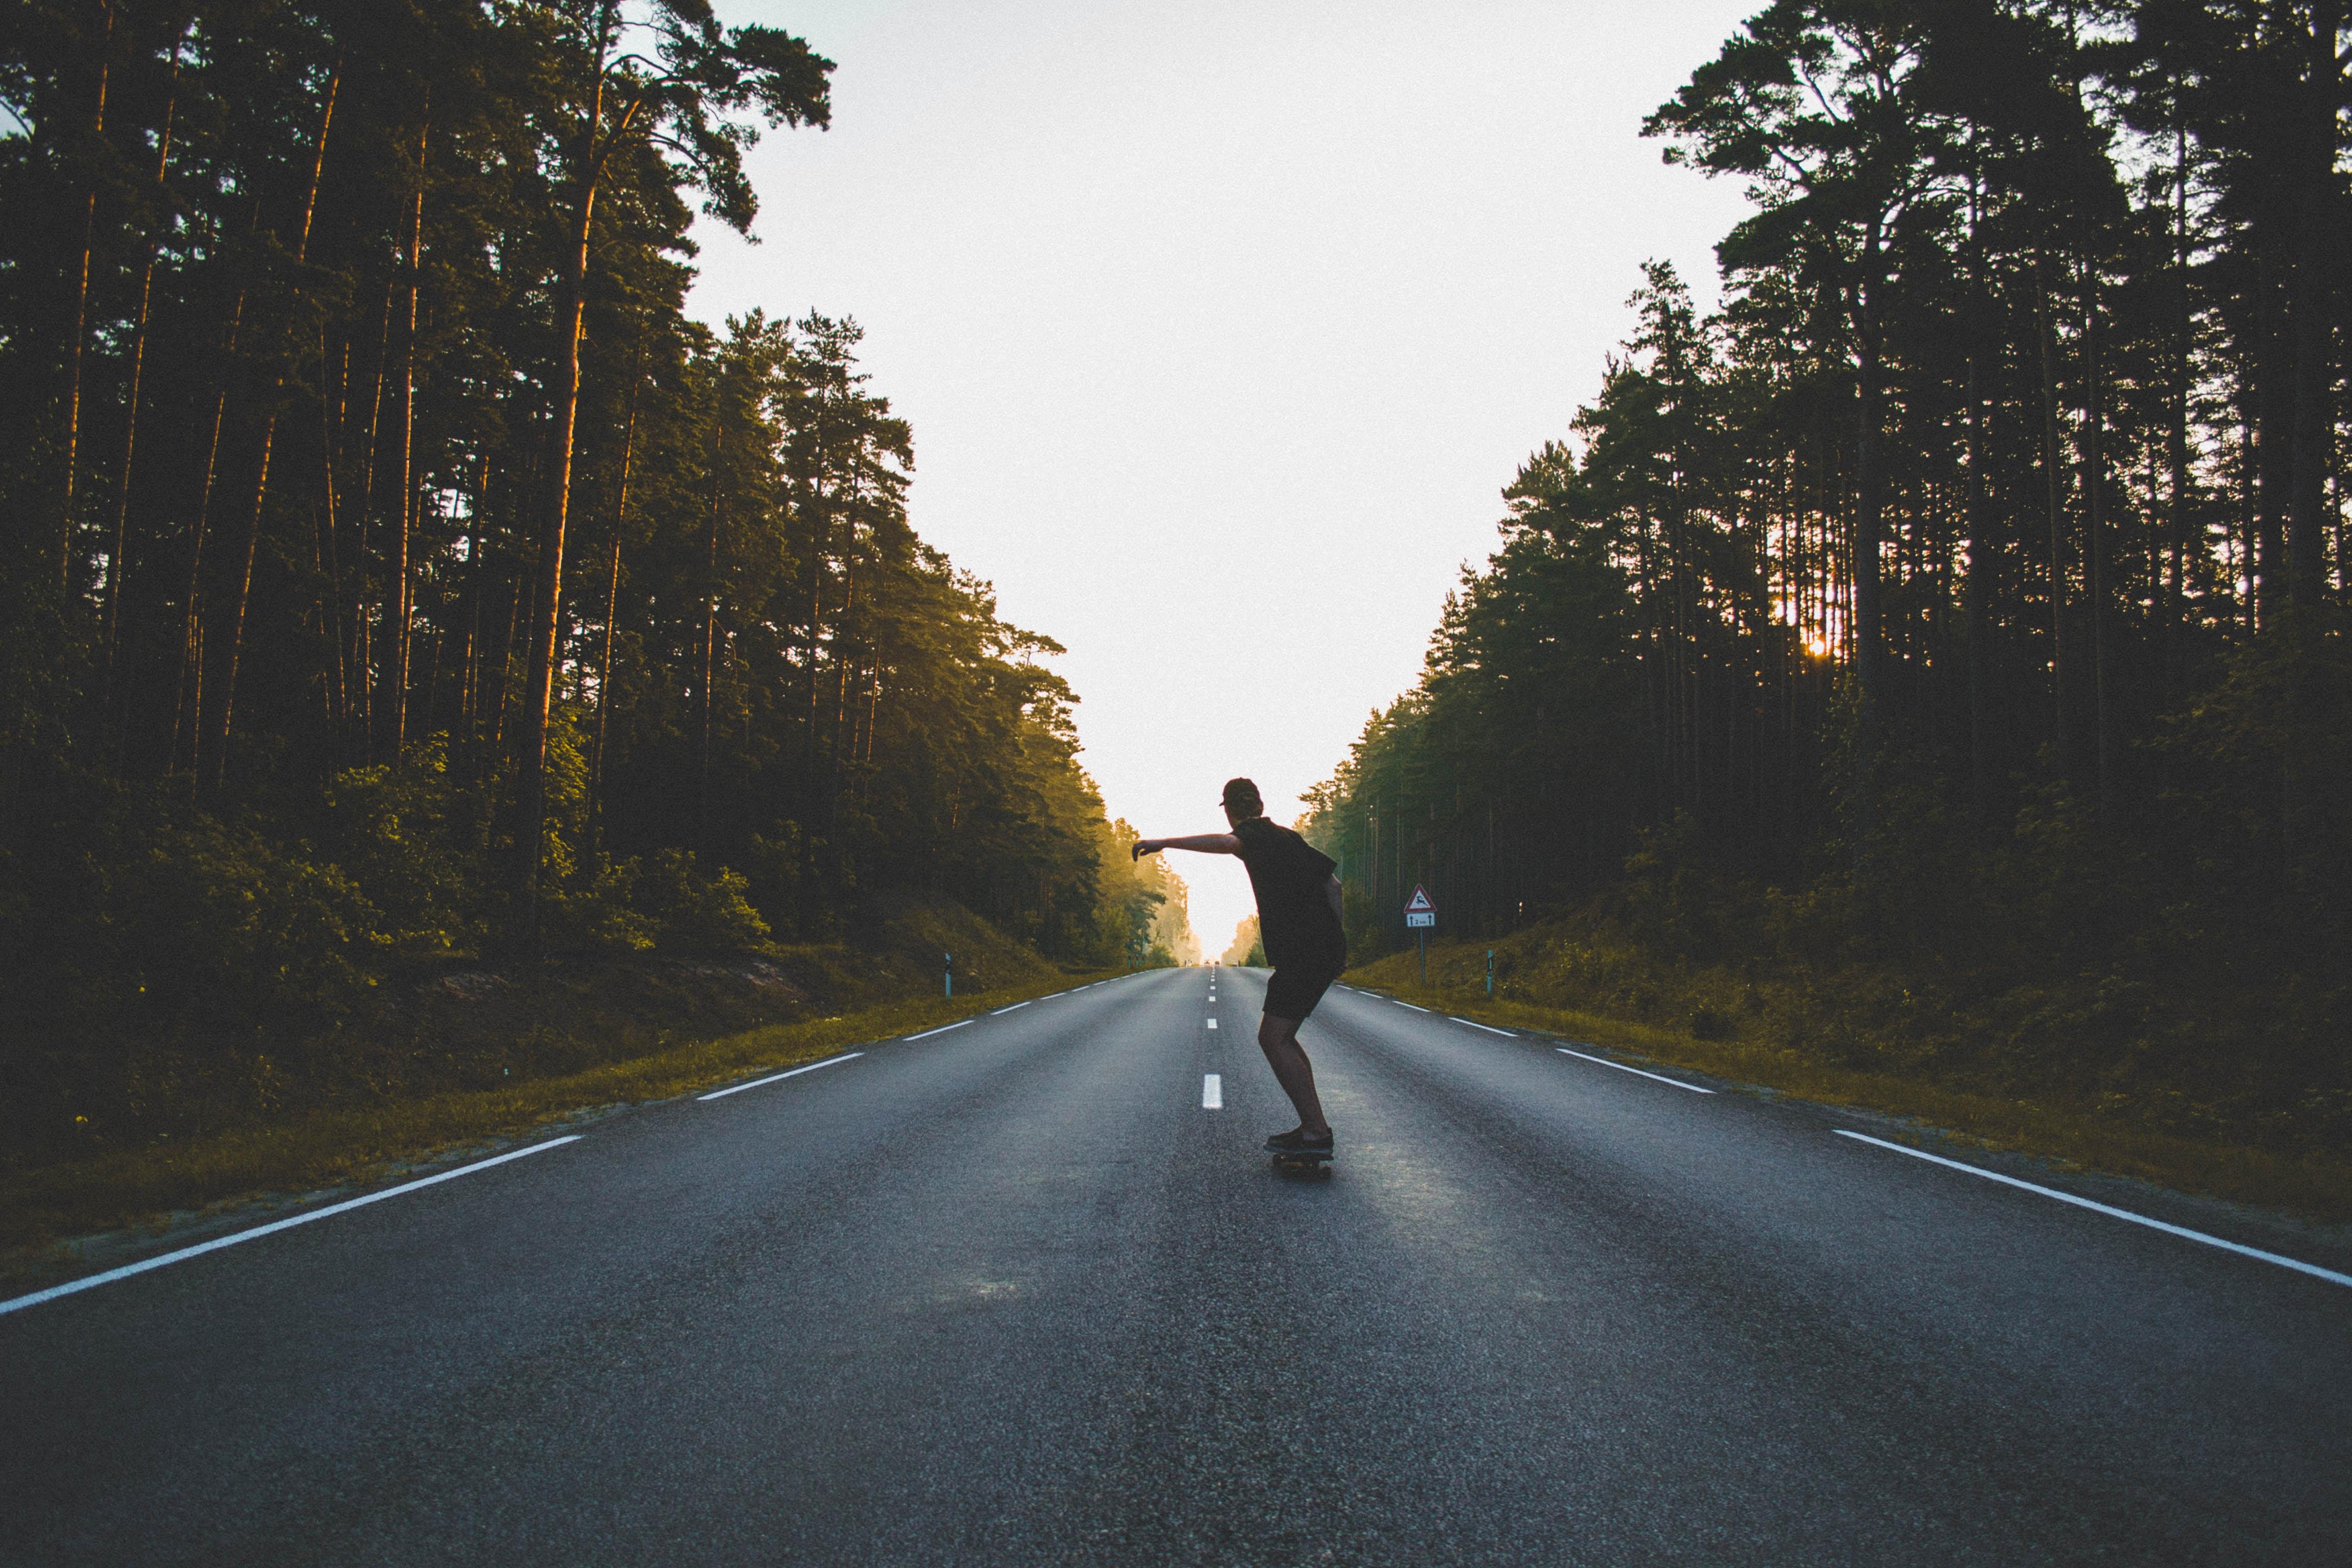 Man skateboarding on asphalt next to forest during sunset